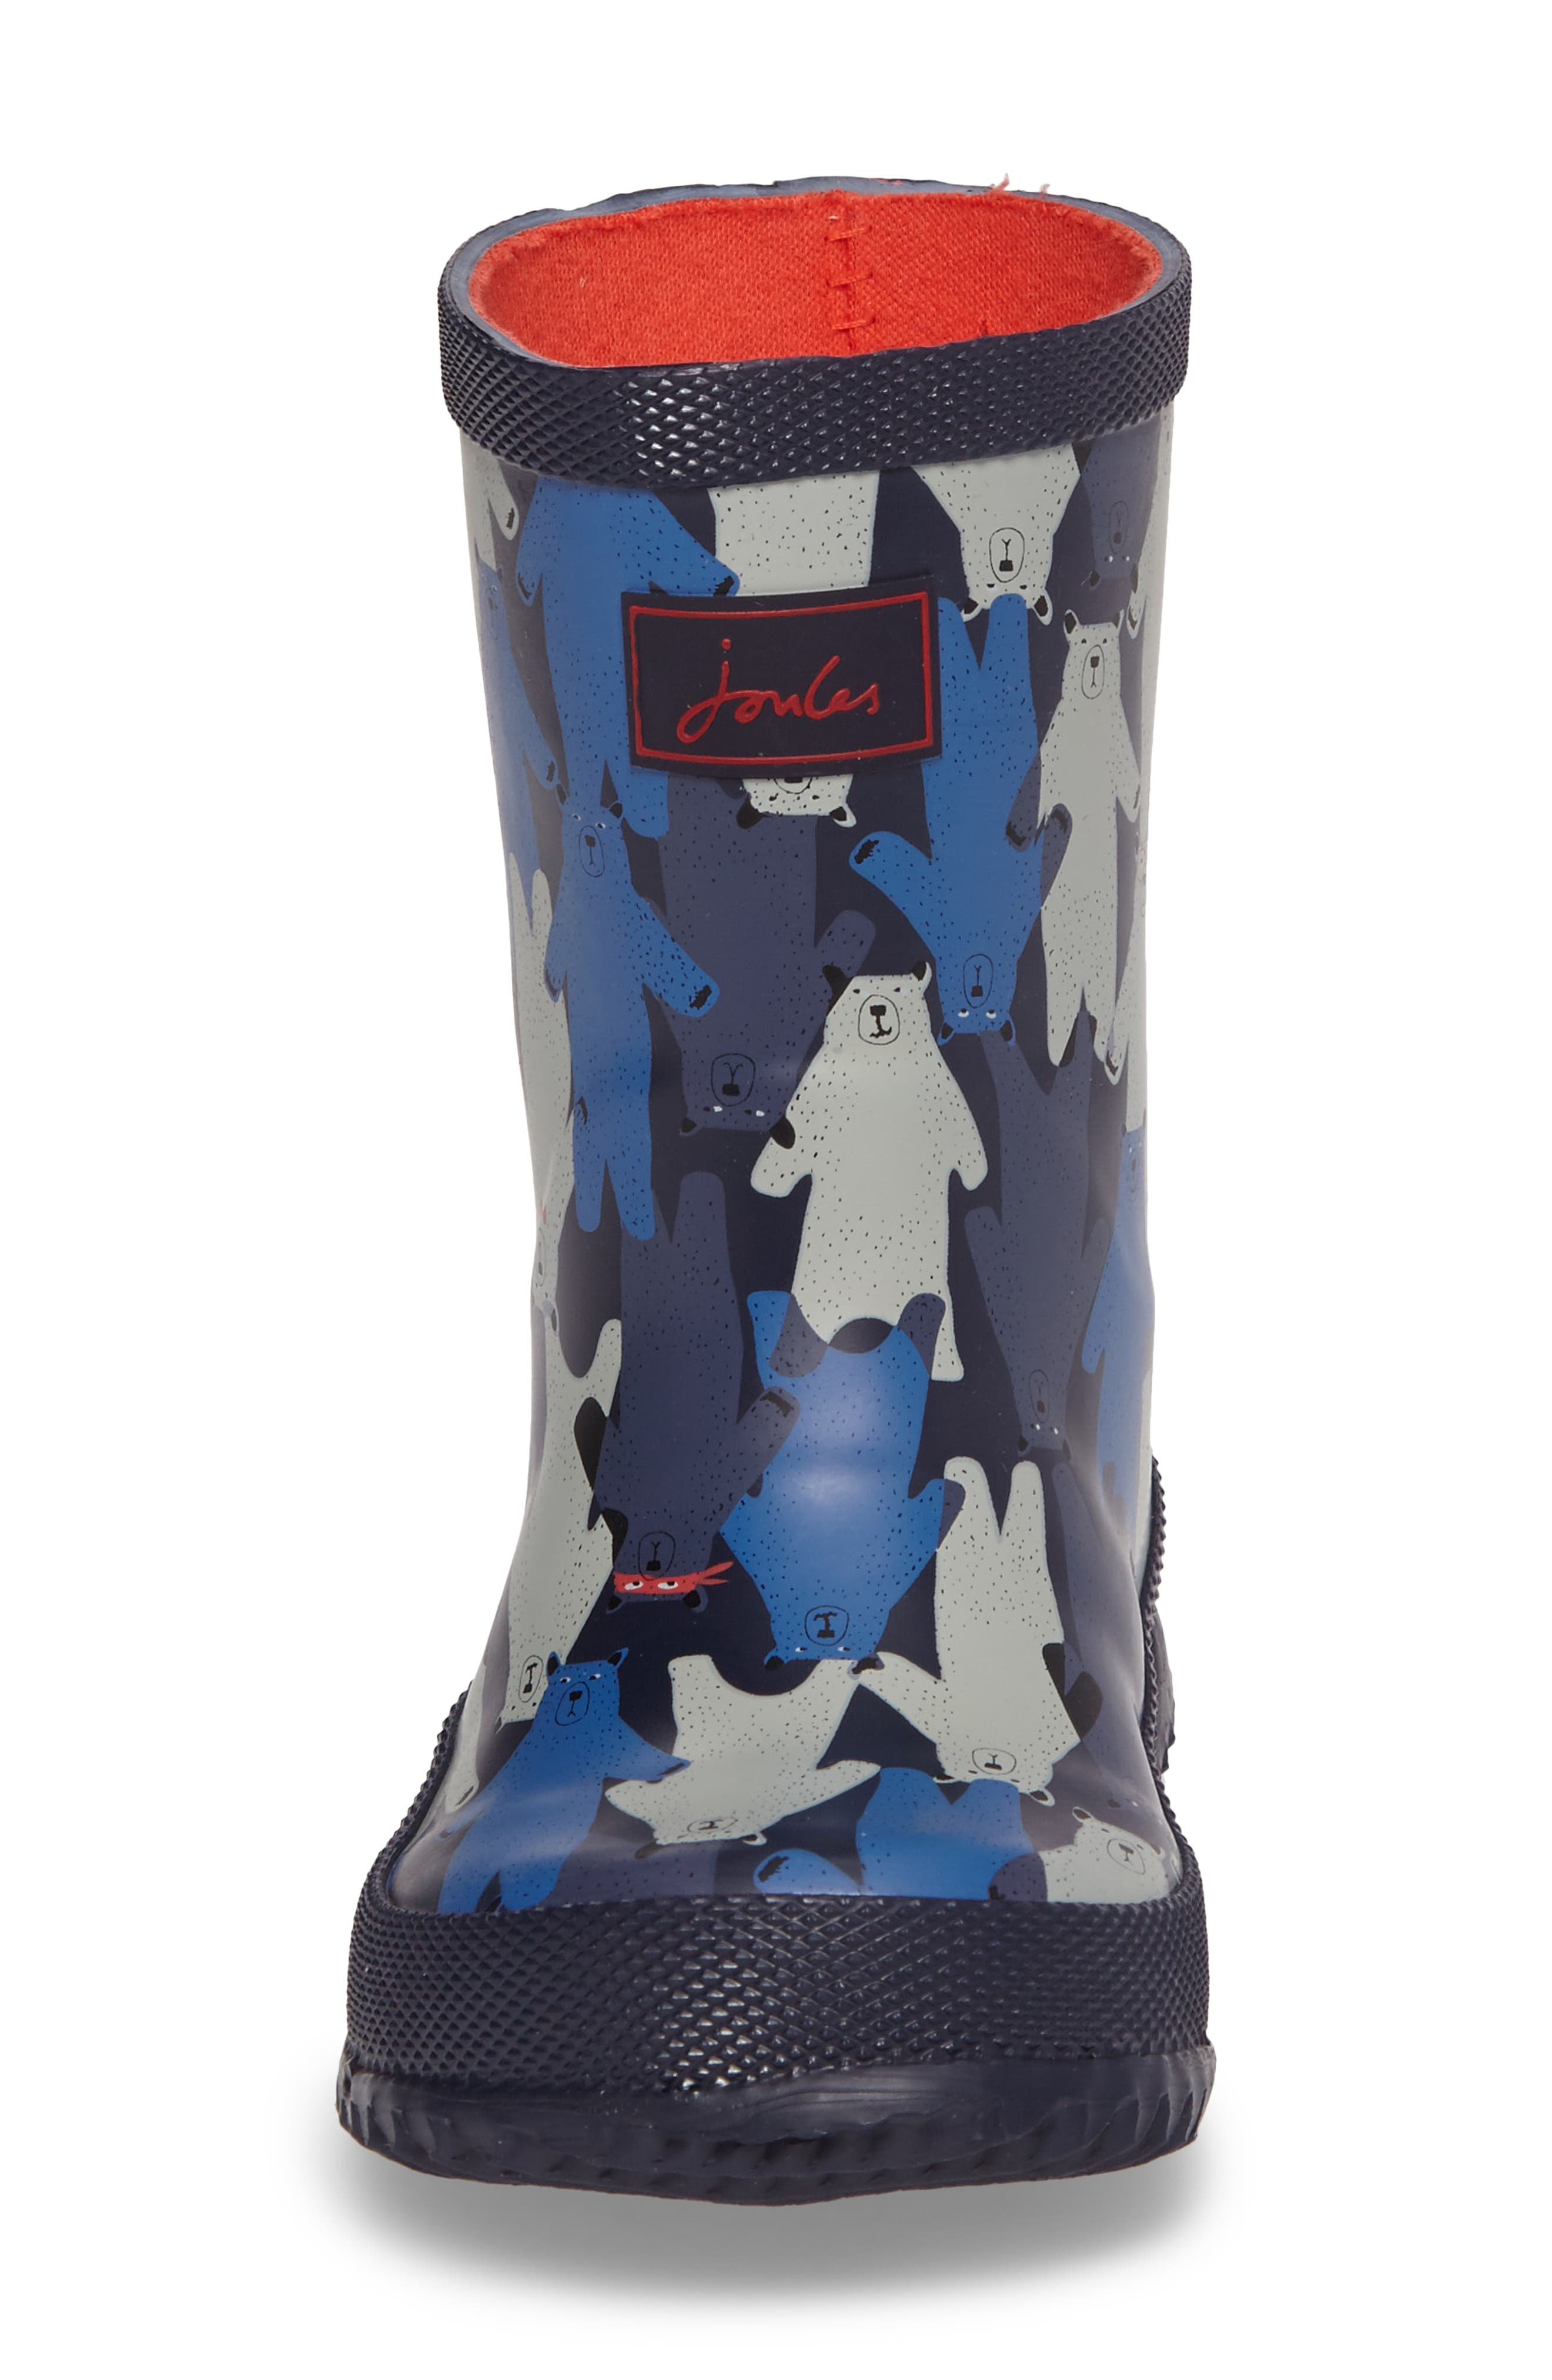 Printed Waterproof Rain Boot,                             Alternate thumbnail 4, color,                             Multi Bear Camo